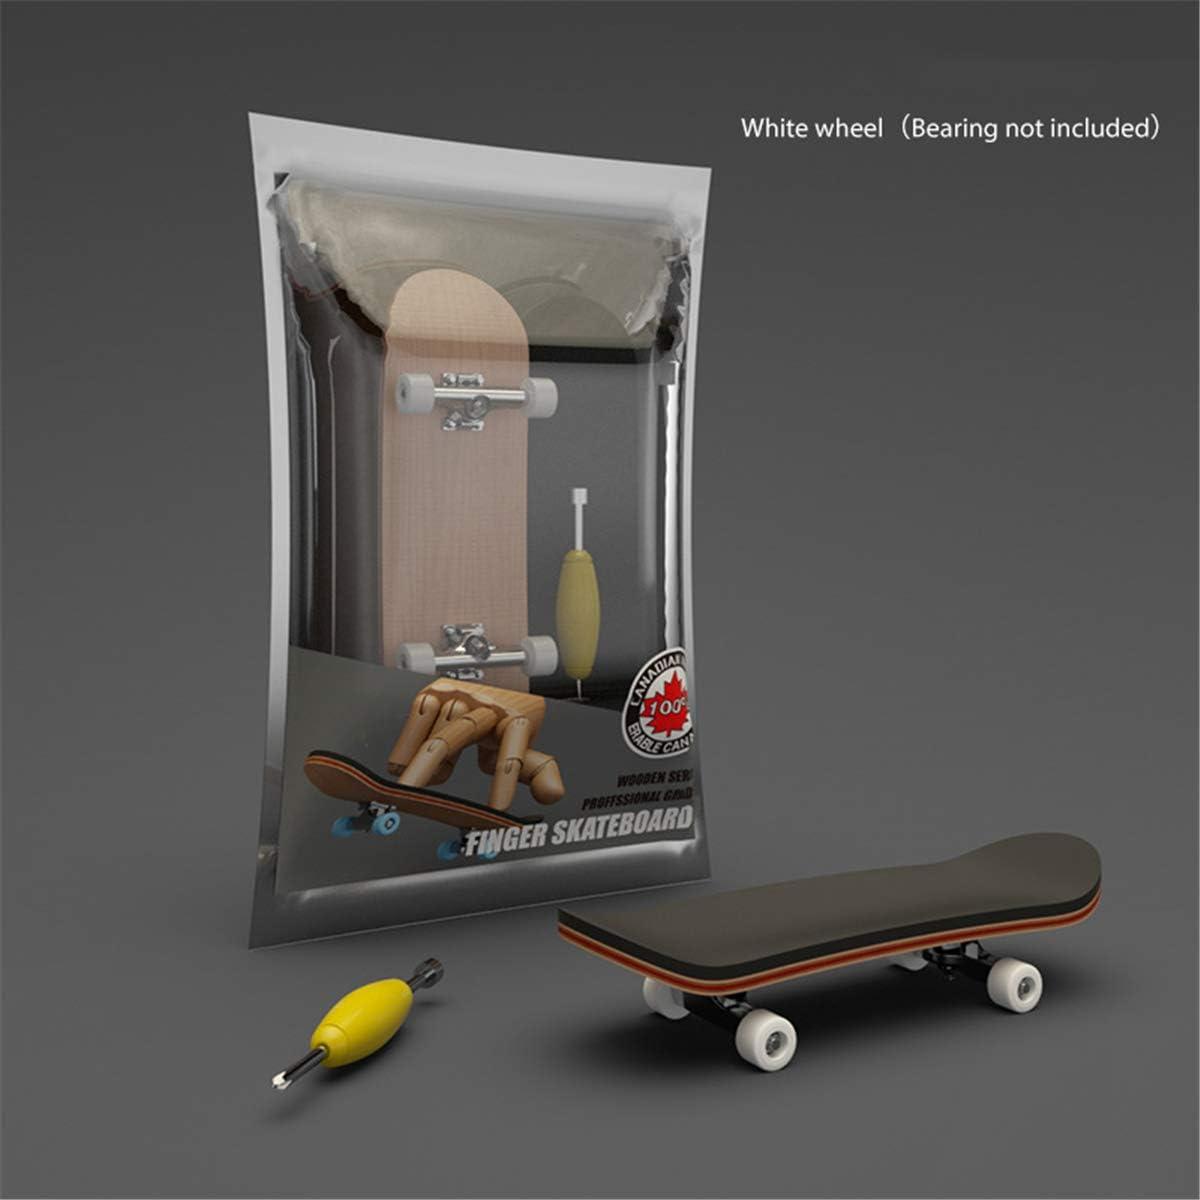 Arlington Mall Albuquerque Mall Goodqueen Finger Skateboard Wooden Toy Professional Fingerboard